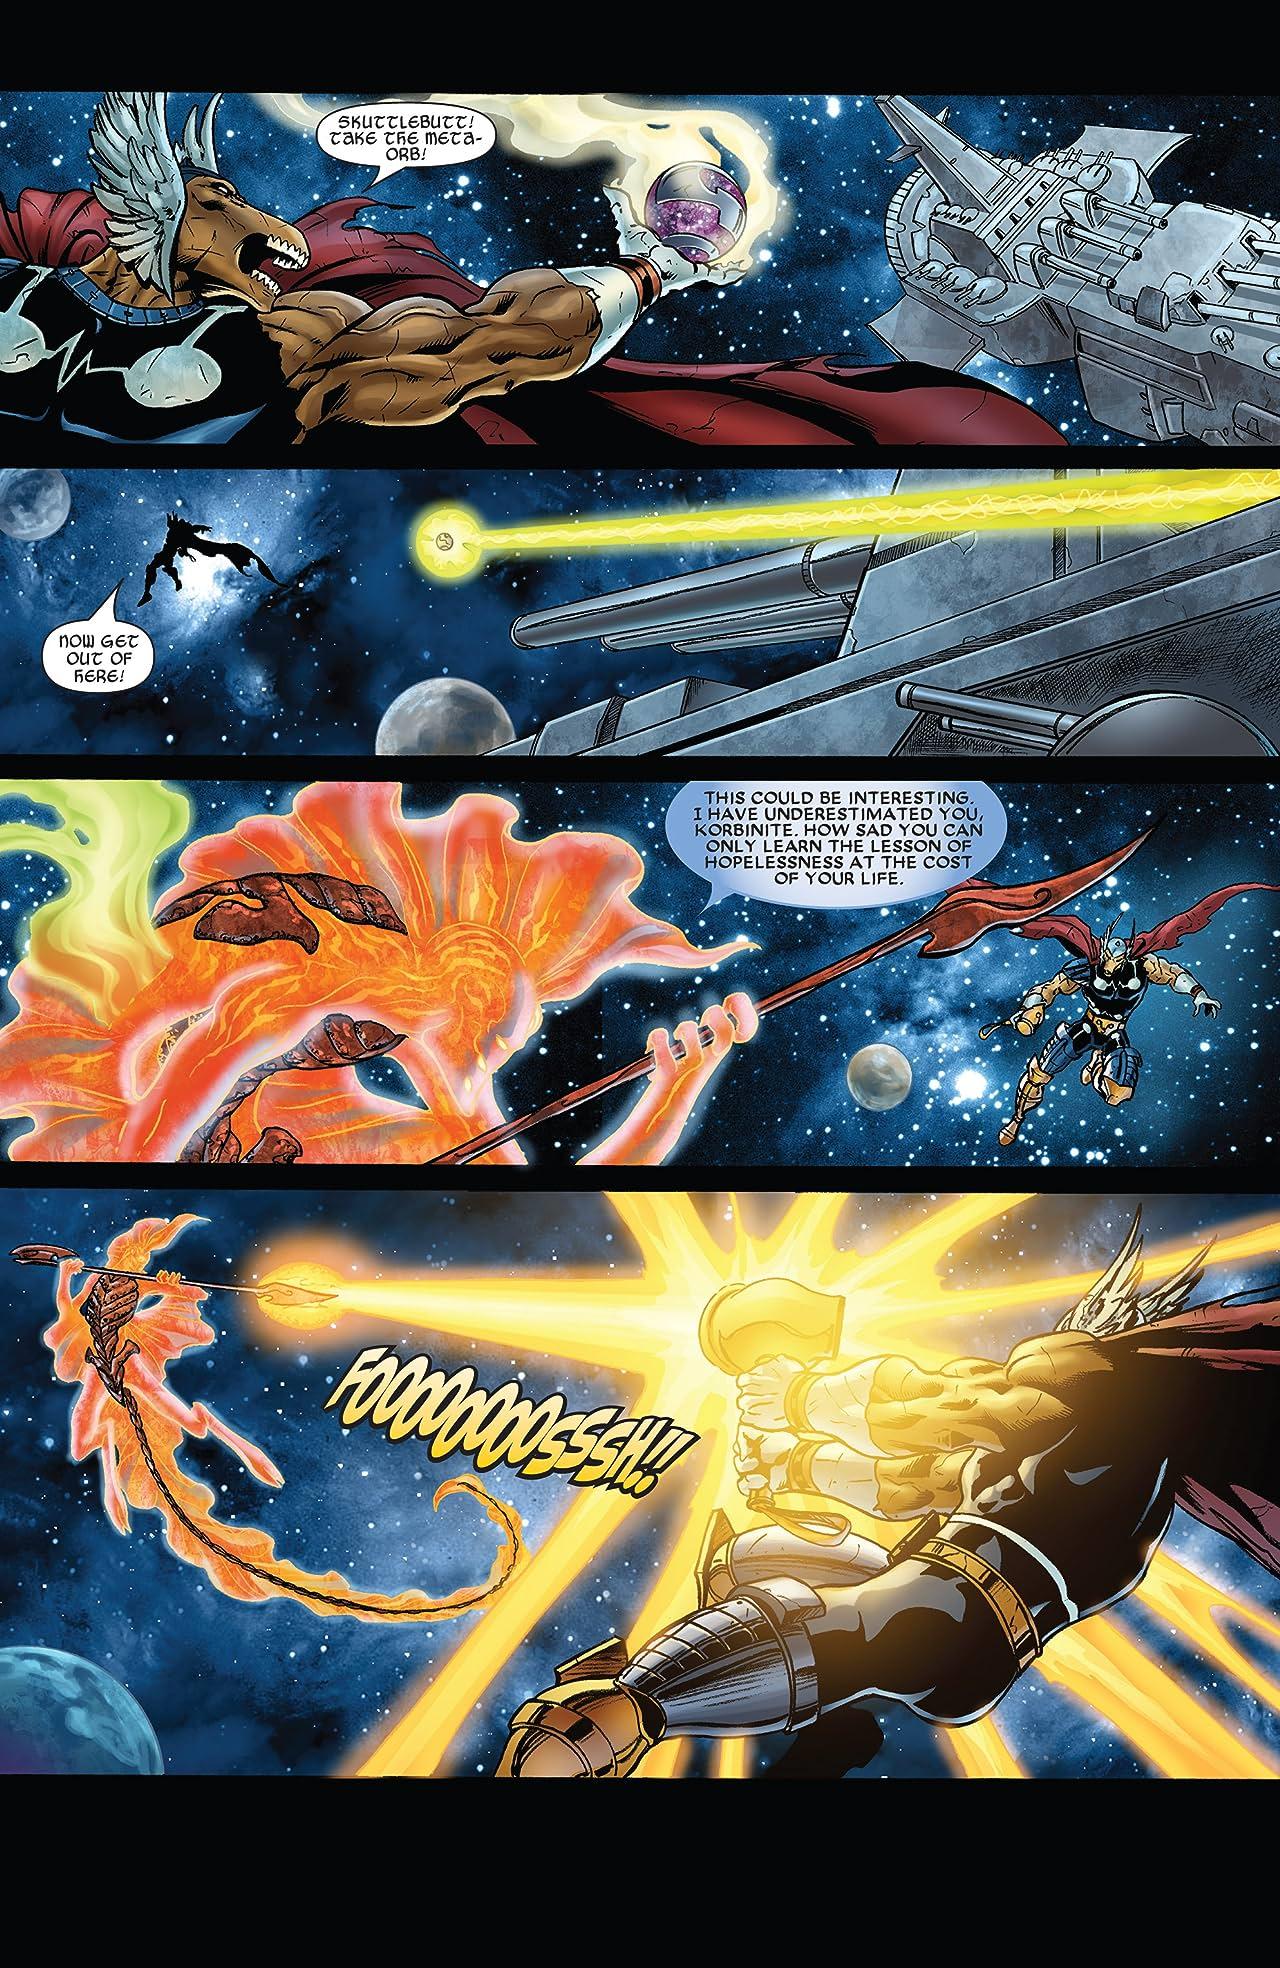 Stormbreaker: The Saga Of Beta Ray Bill #3 (of 6)